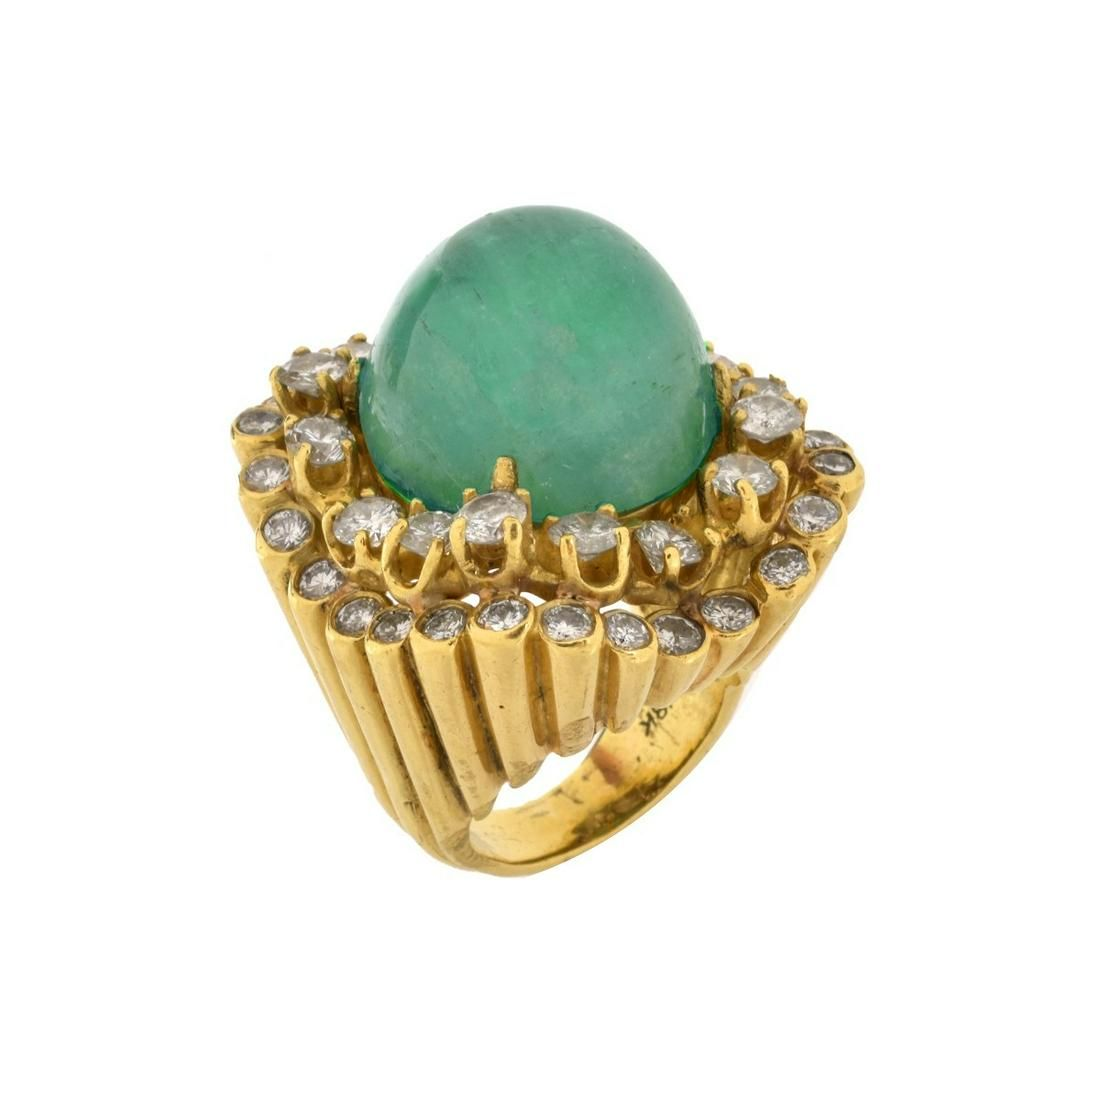 Emerald, Diamond and 18K Ring